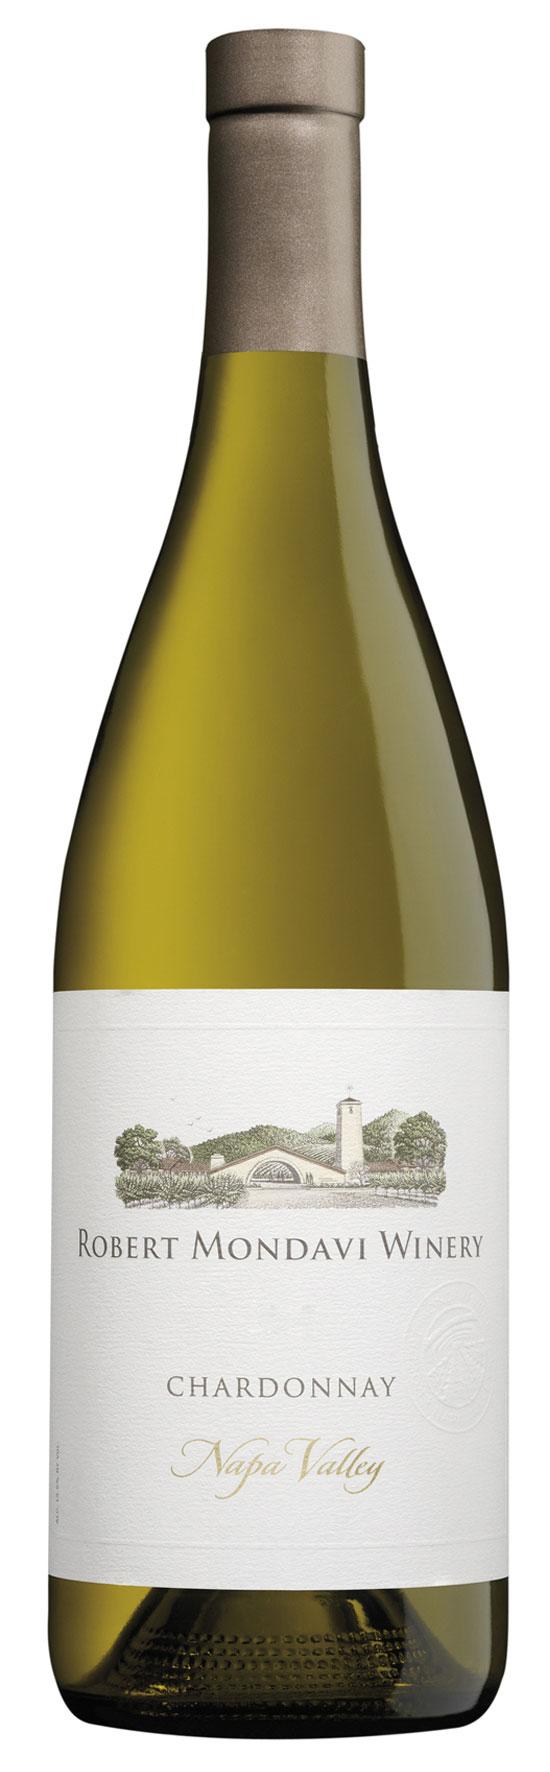 Robert Mondavi Winery Napa Valley Chardonnay 2017